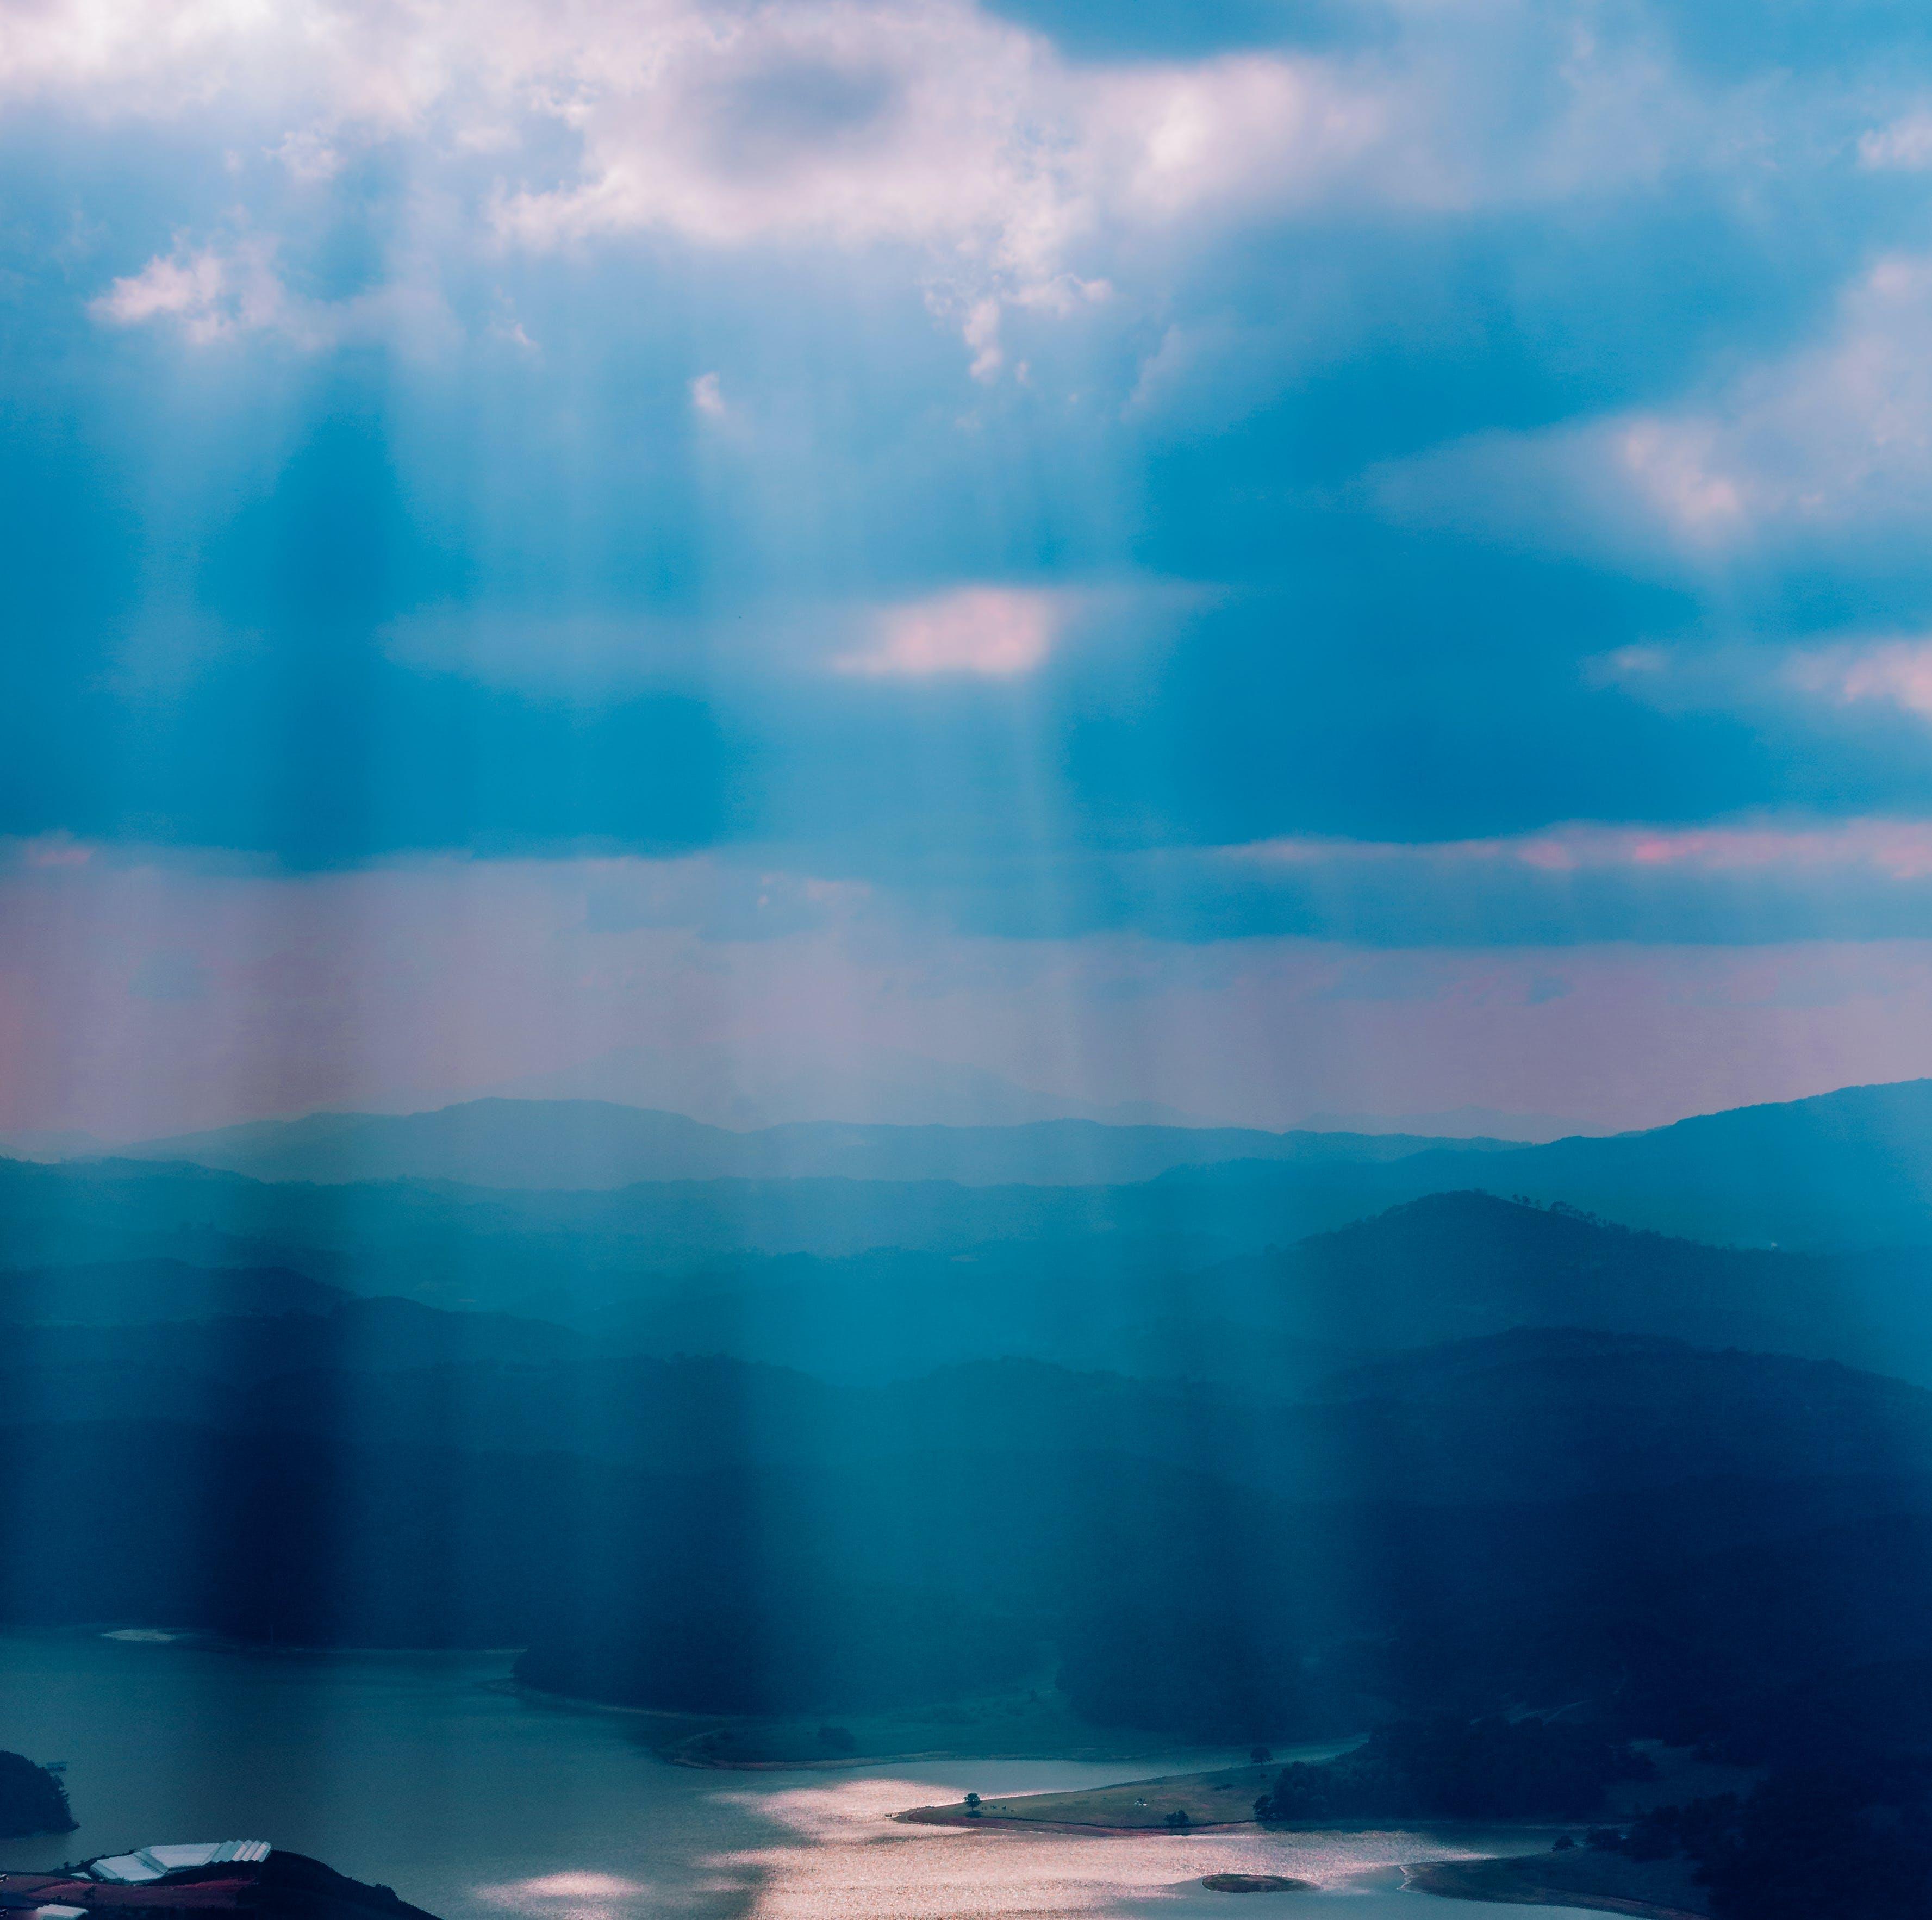 Calm Body of Water Under Sun Rays